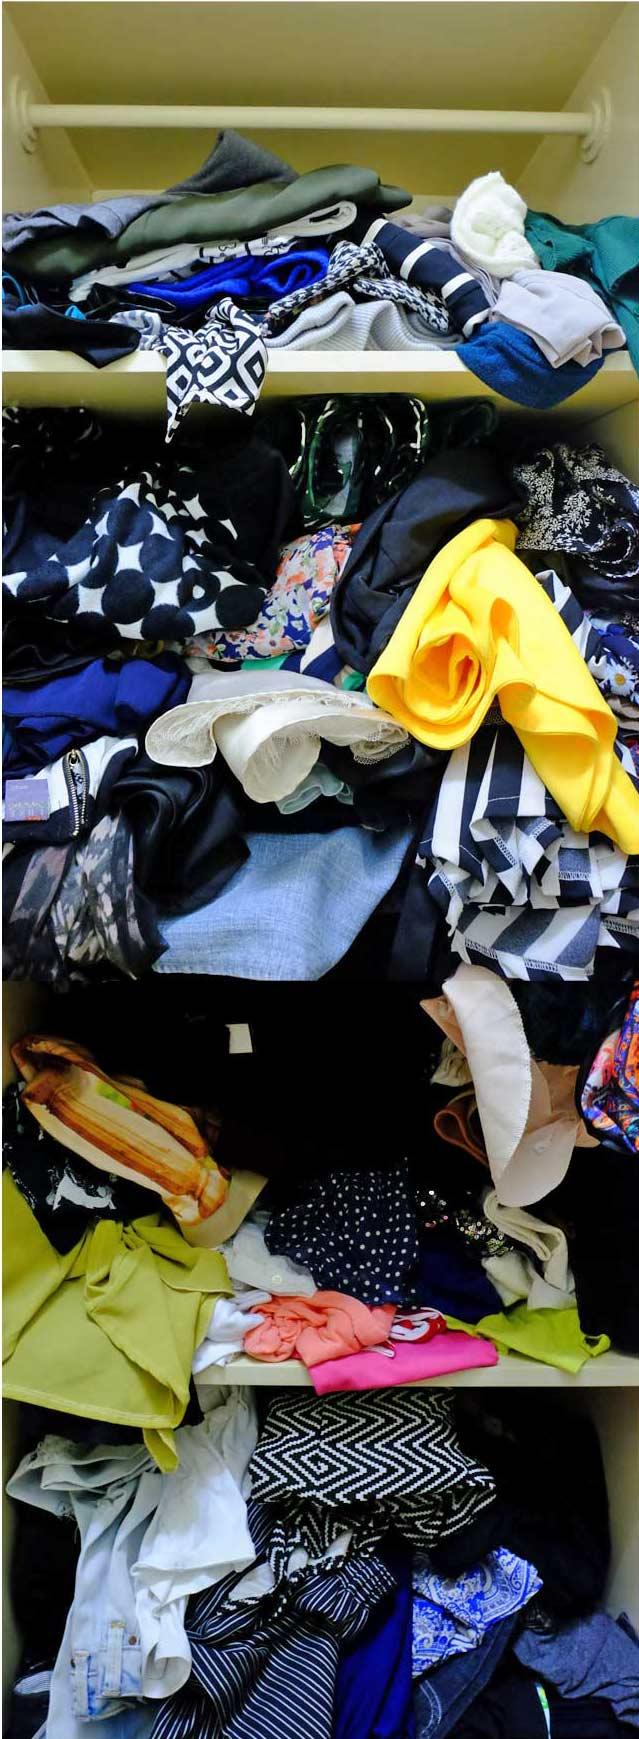 Aaaaannndd this is my closet.